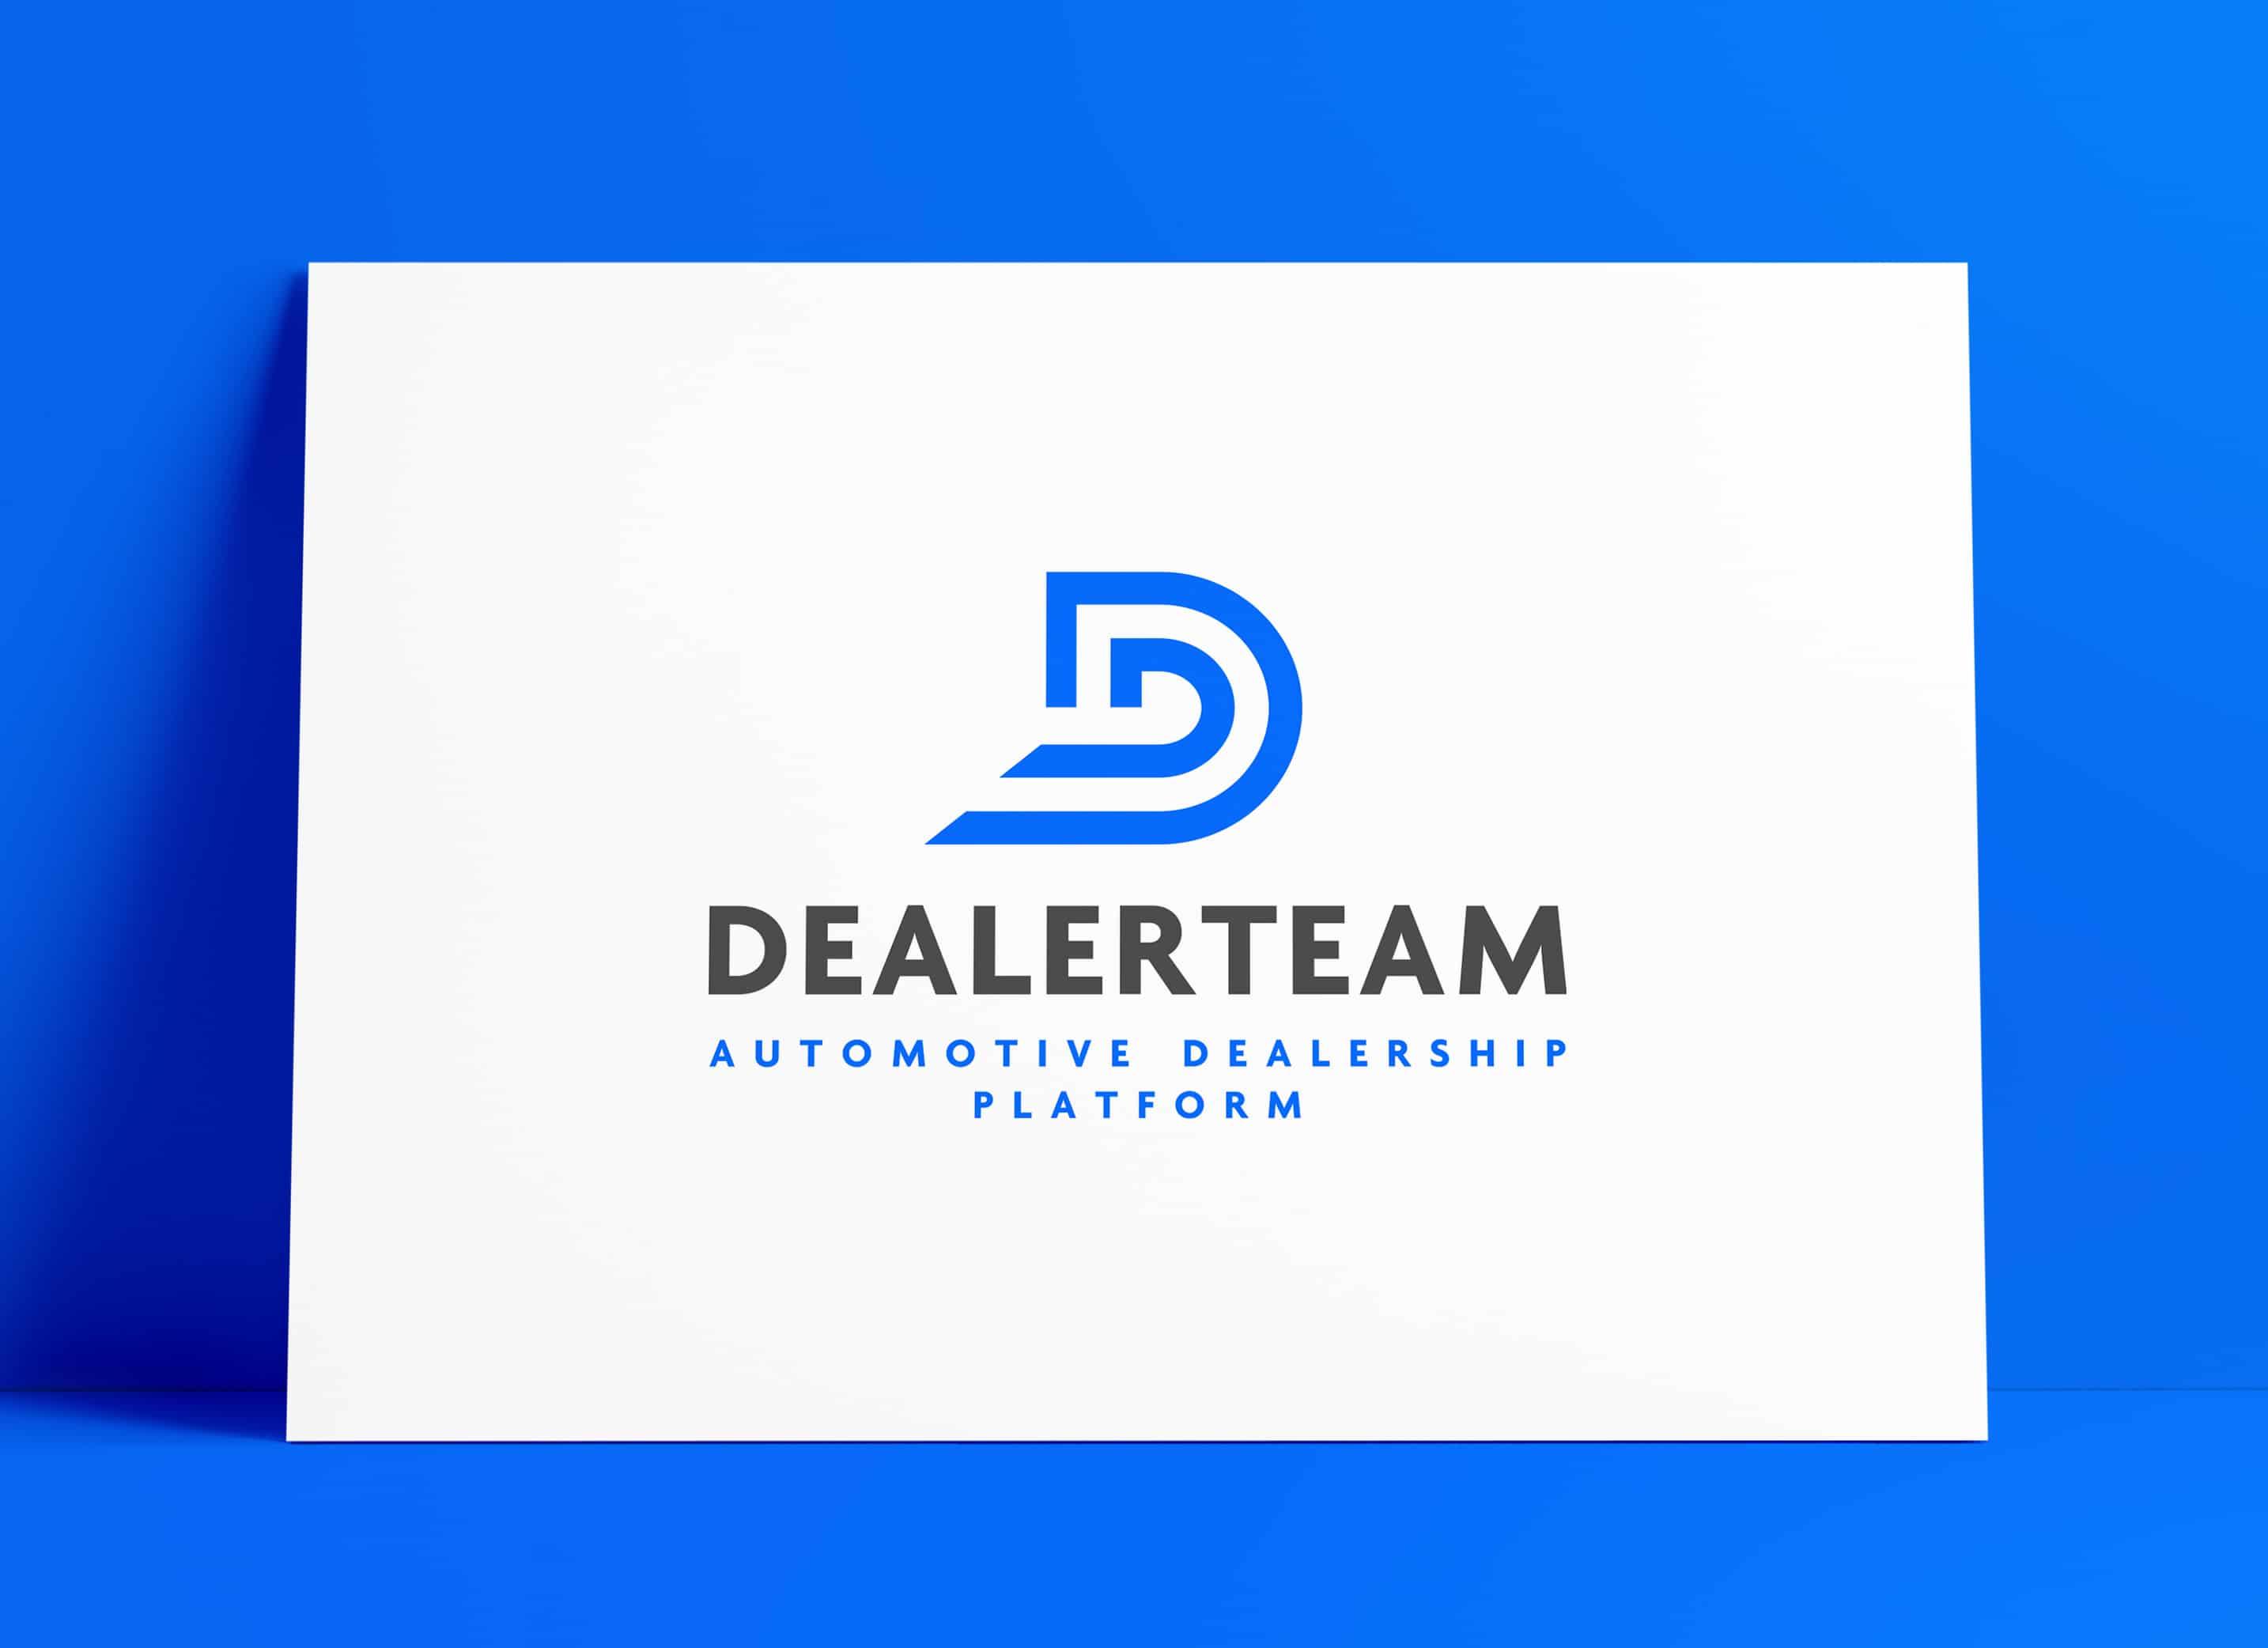 DealerTeam Automotive Logo Designed by The Logo Smith